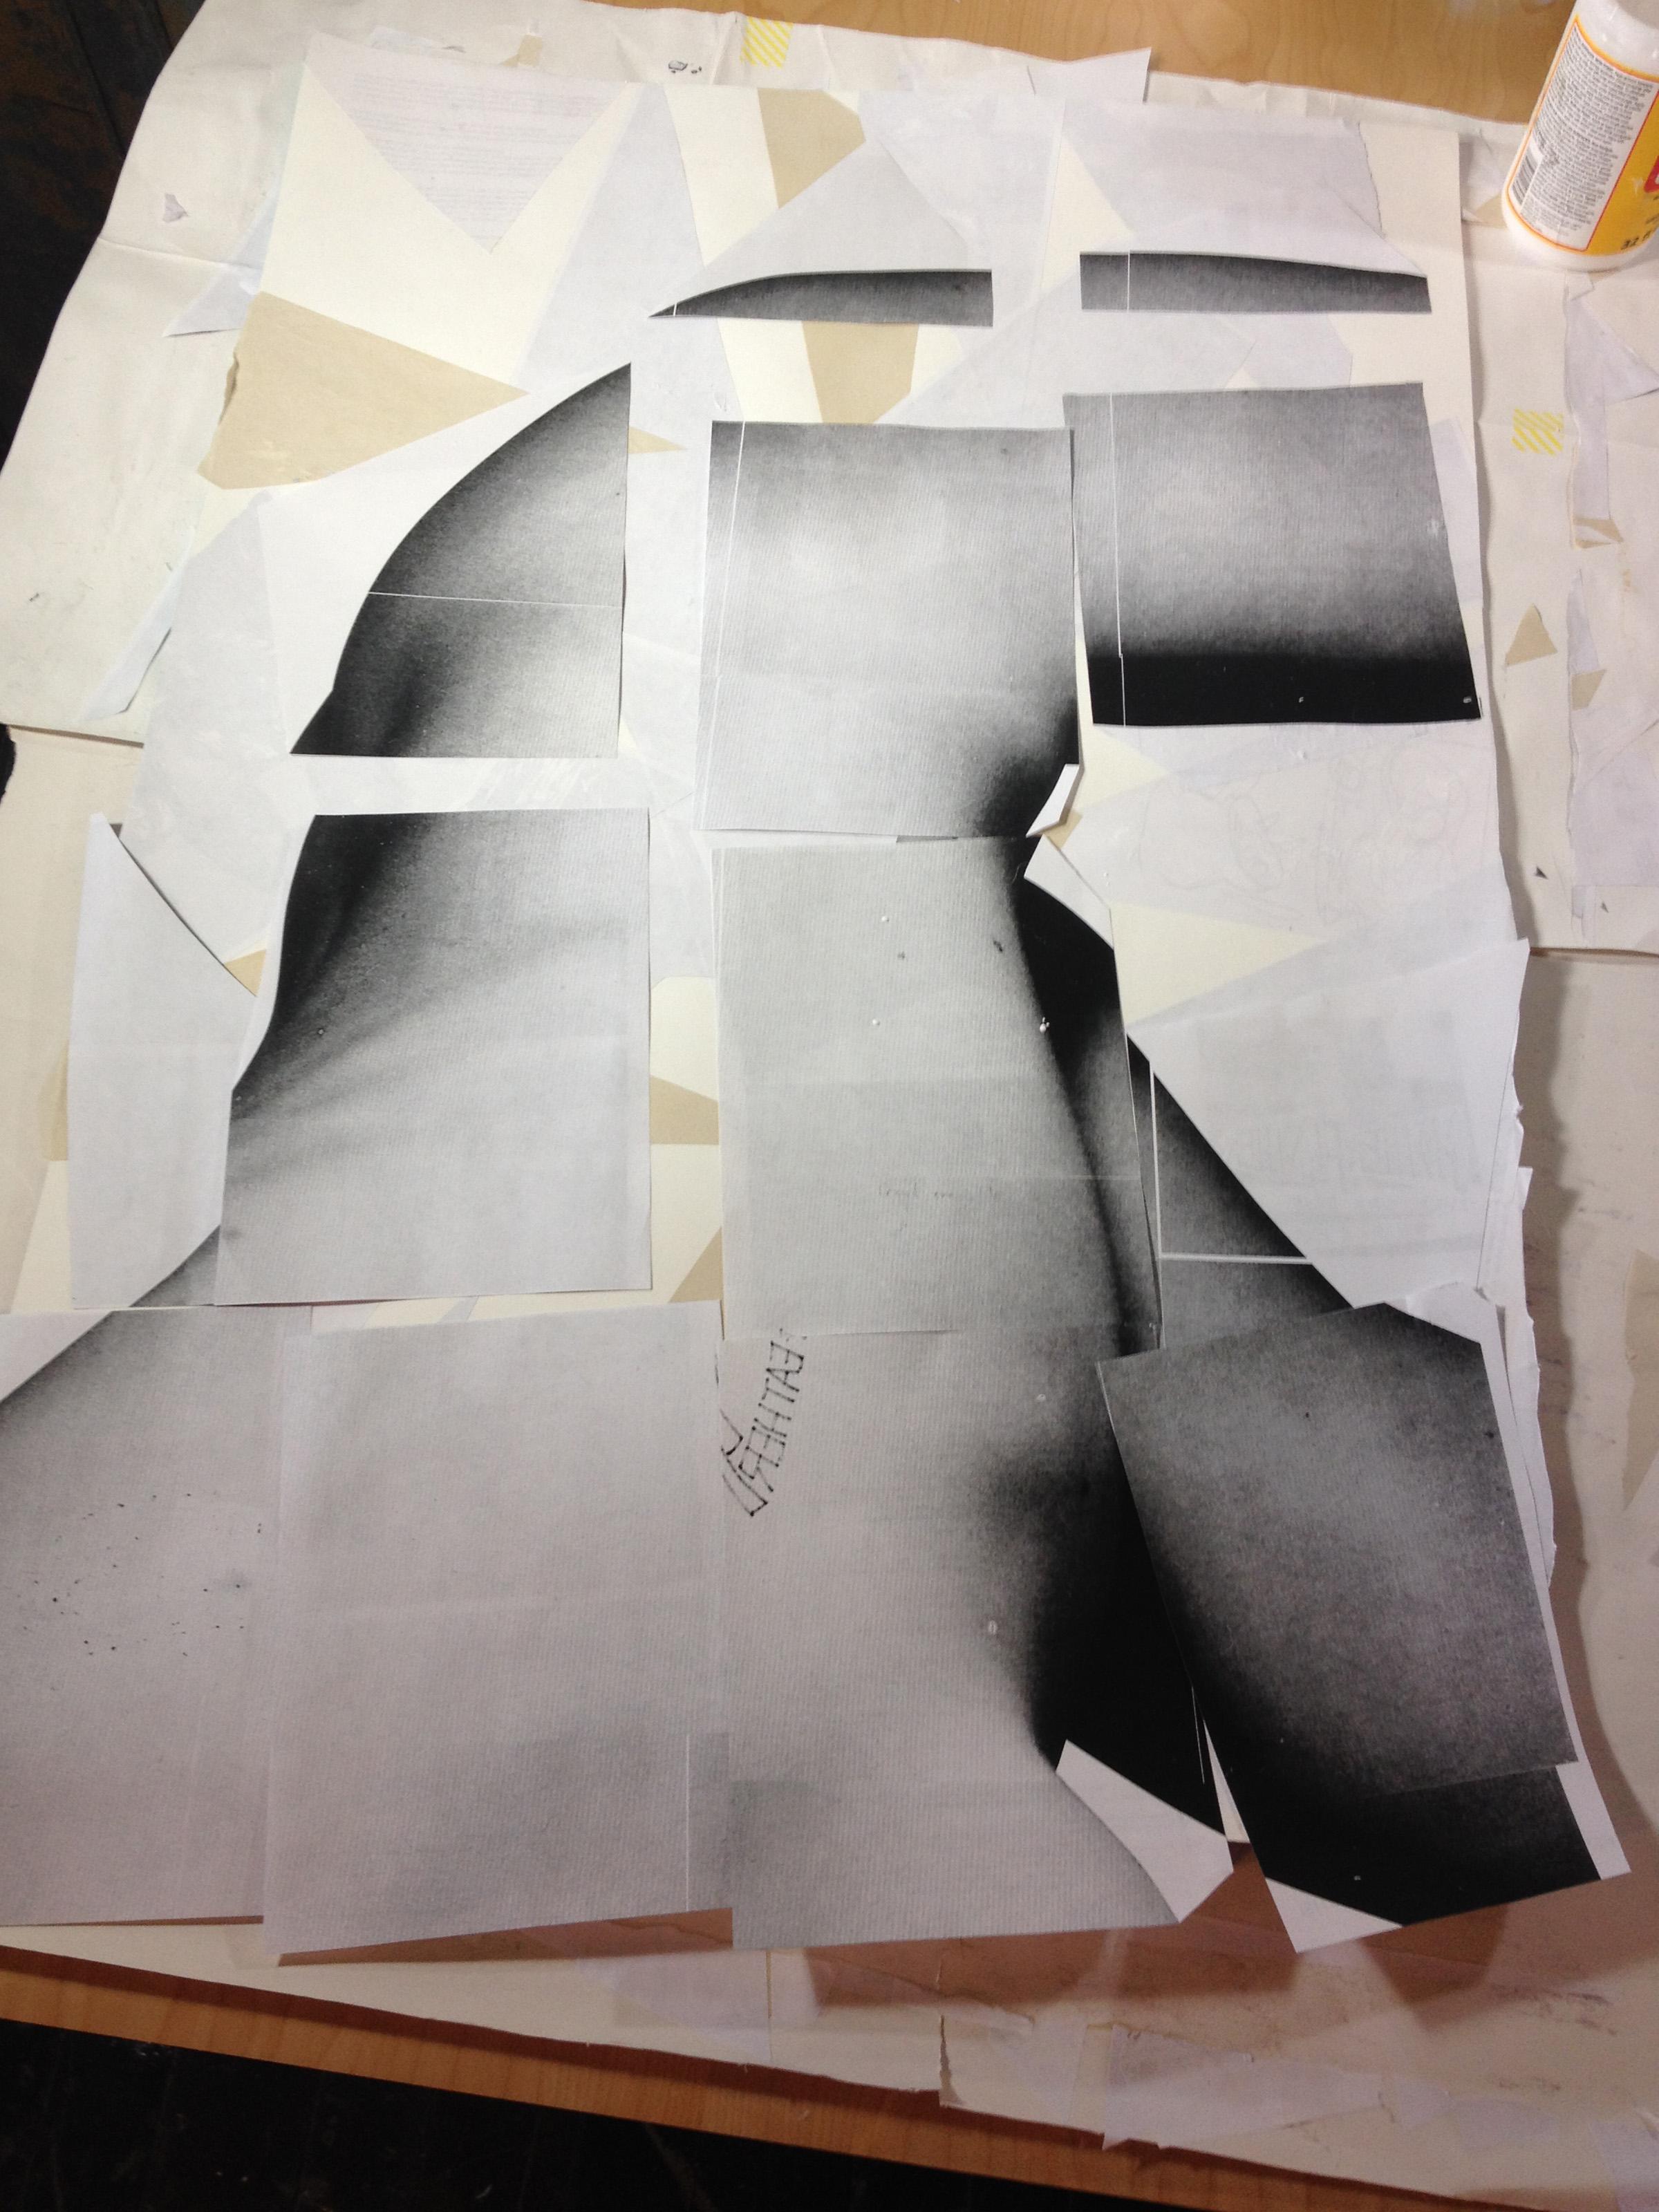 Mark No. 5: Collage in progress